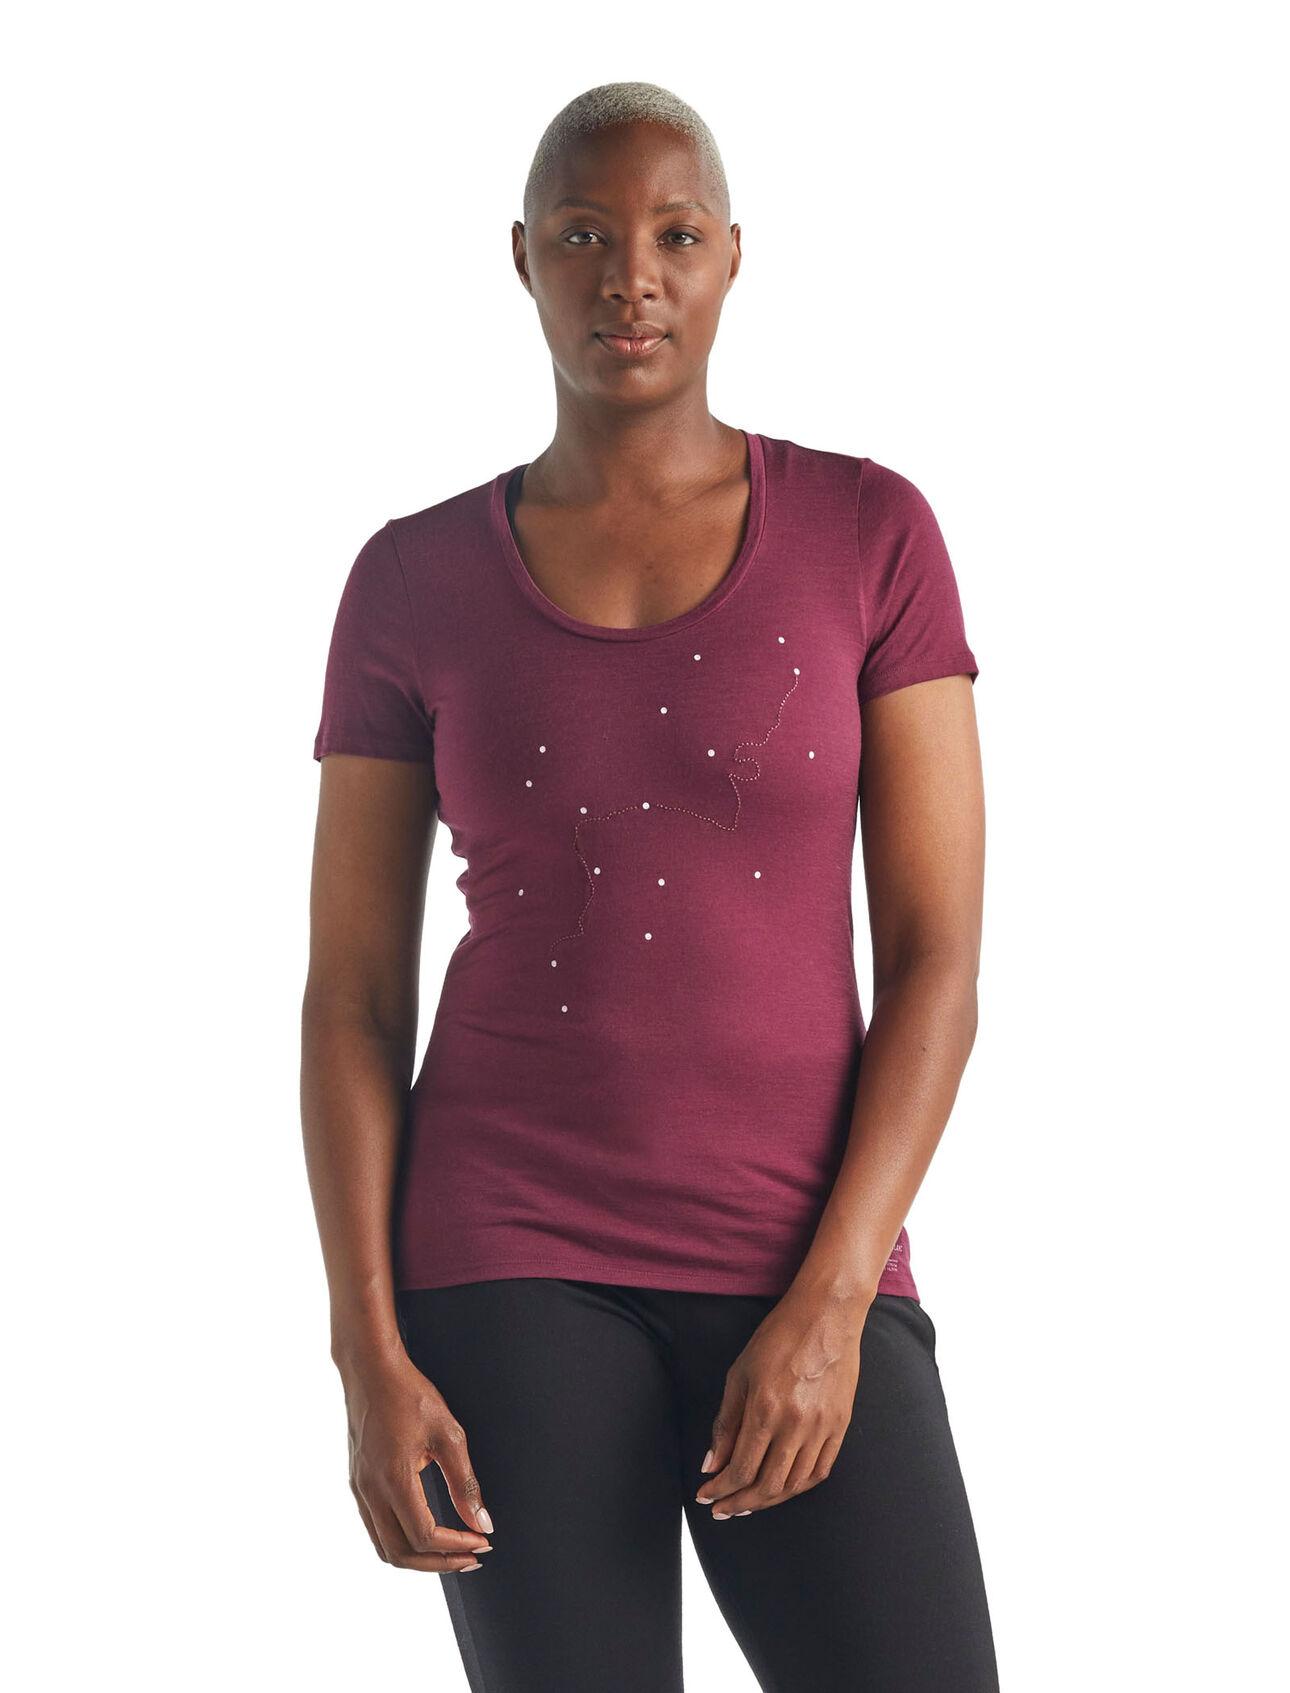 Merino Tech Lite Short Sleeve Scoop Neck T-Shirt Tour du Mont Blanc